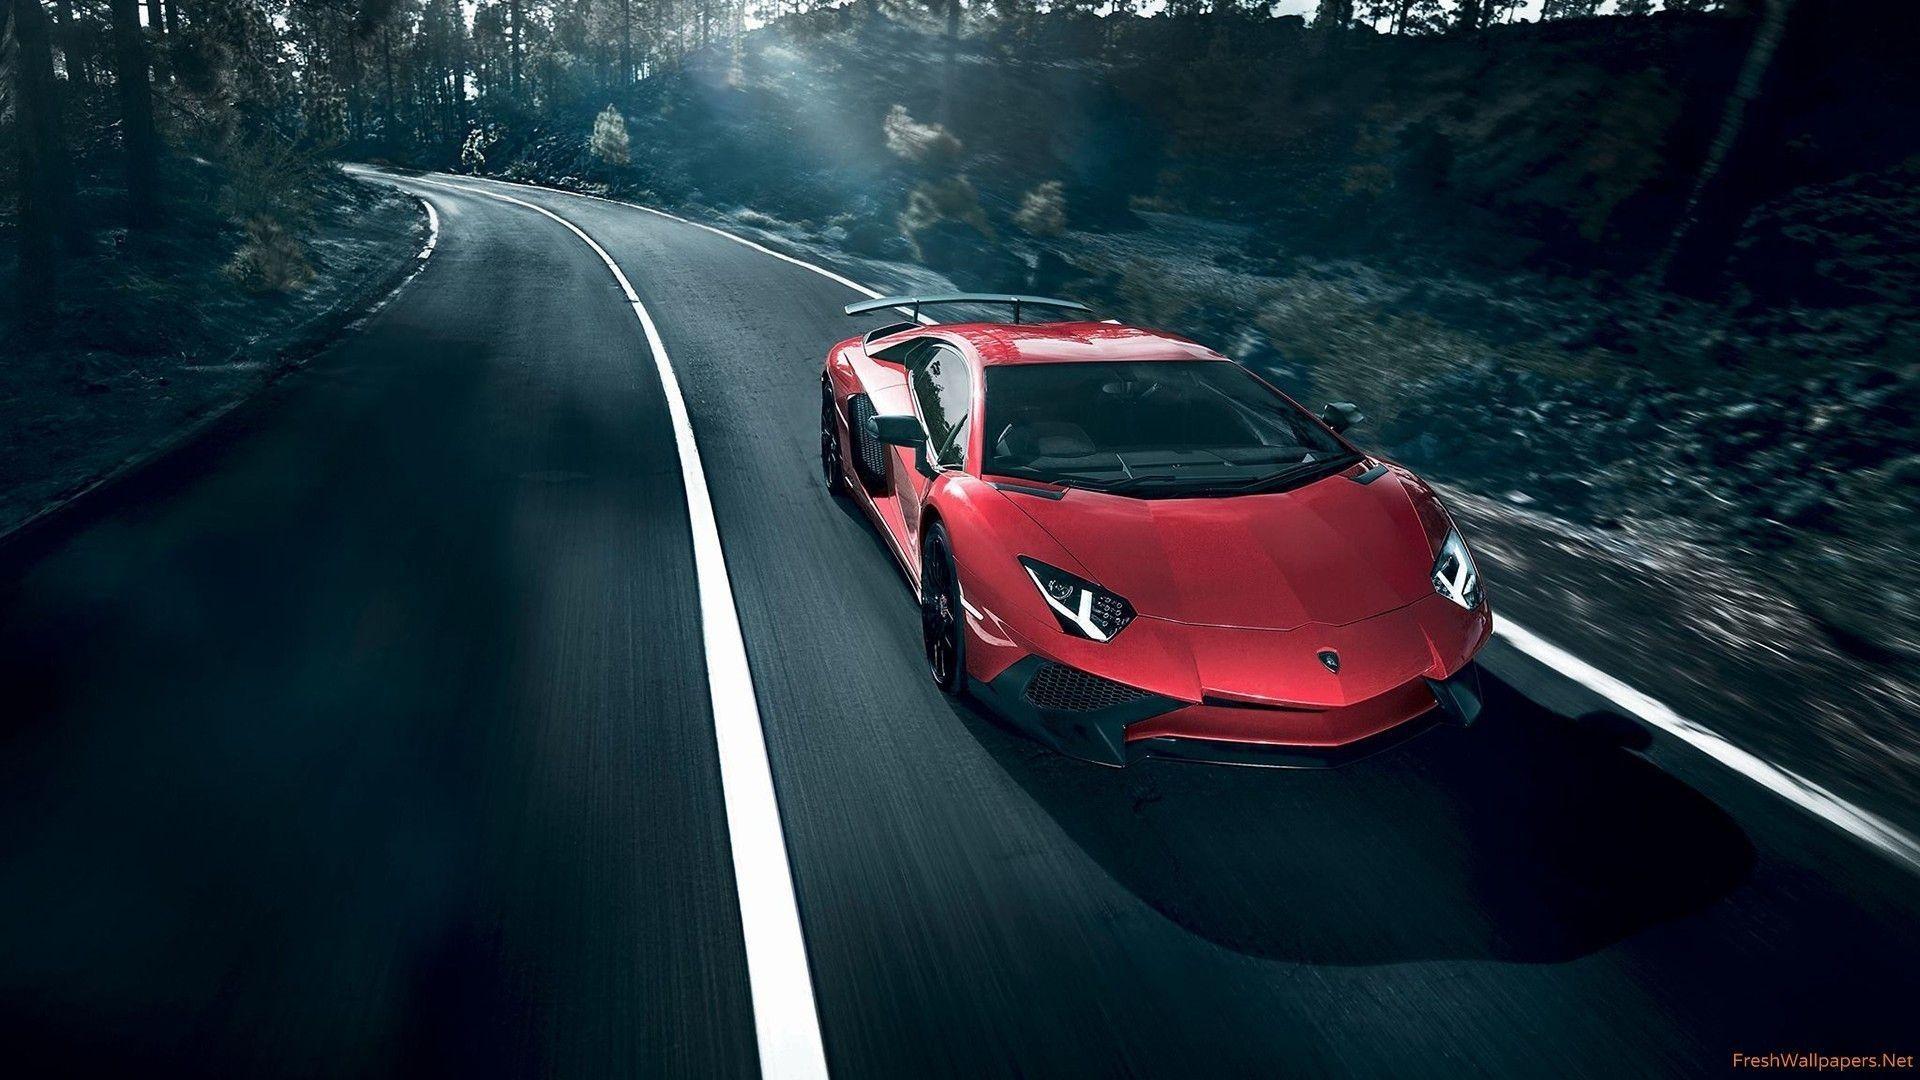 10 New Lamborghini Aventador Sv Wallpaper Full Hd 1080p For Pc